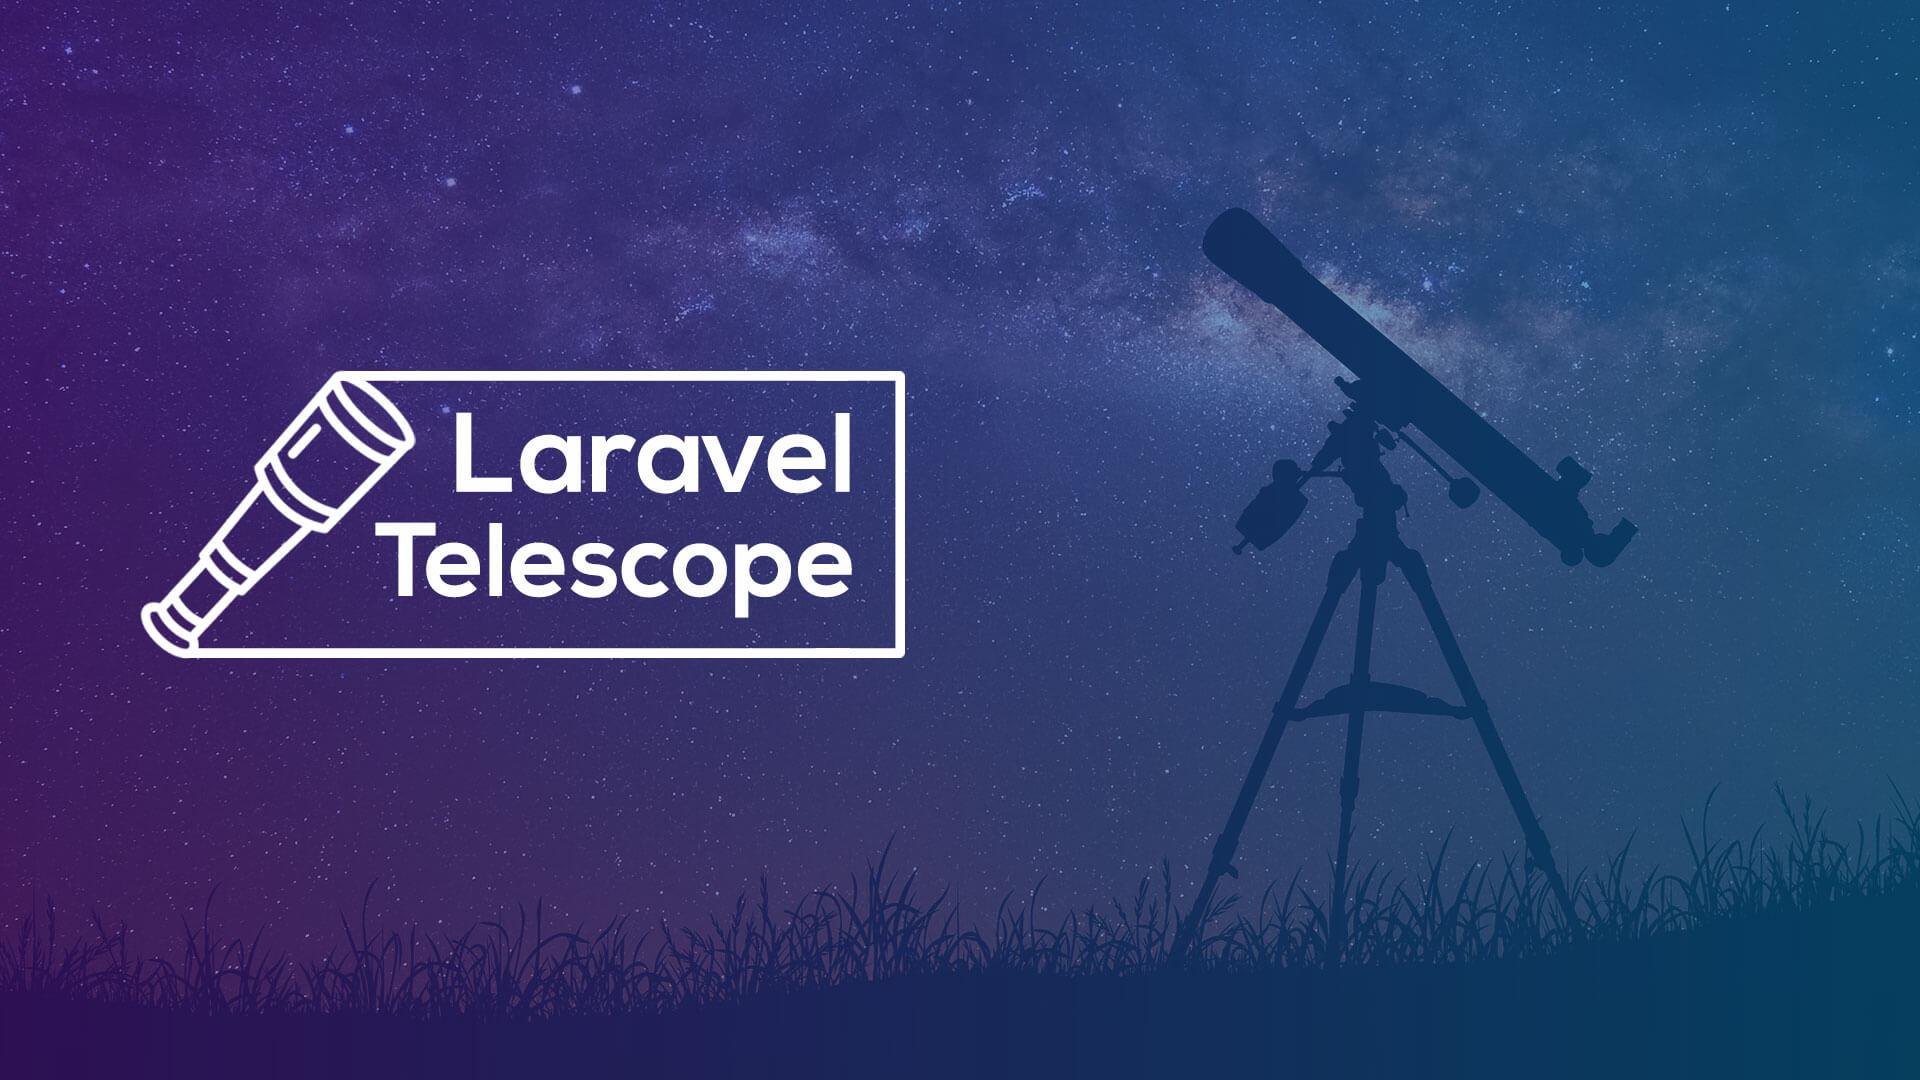 laravel telescope 1 - وبلاگ